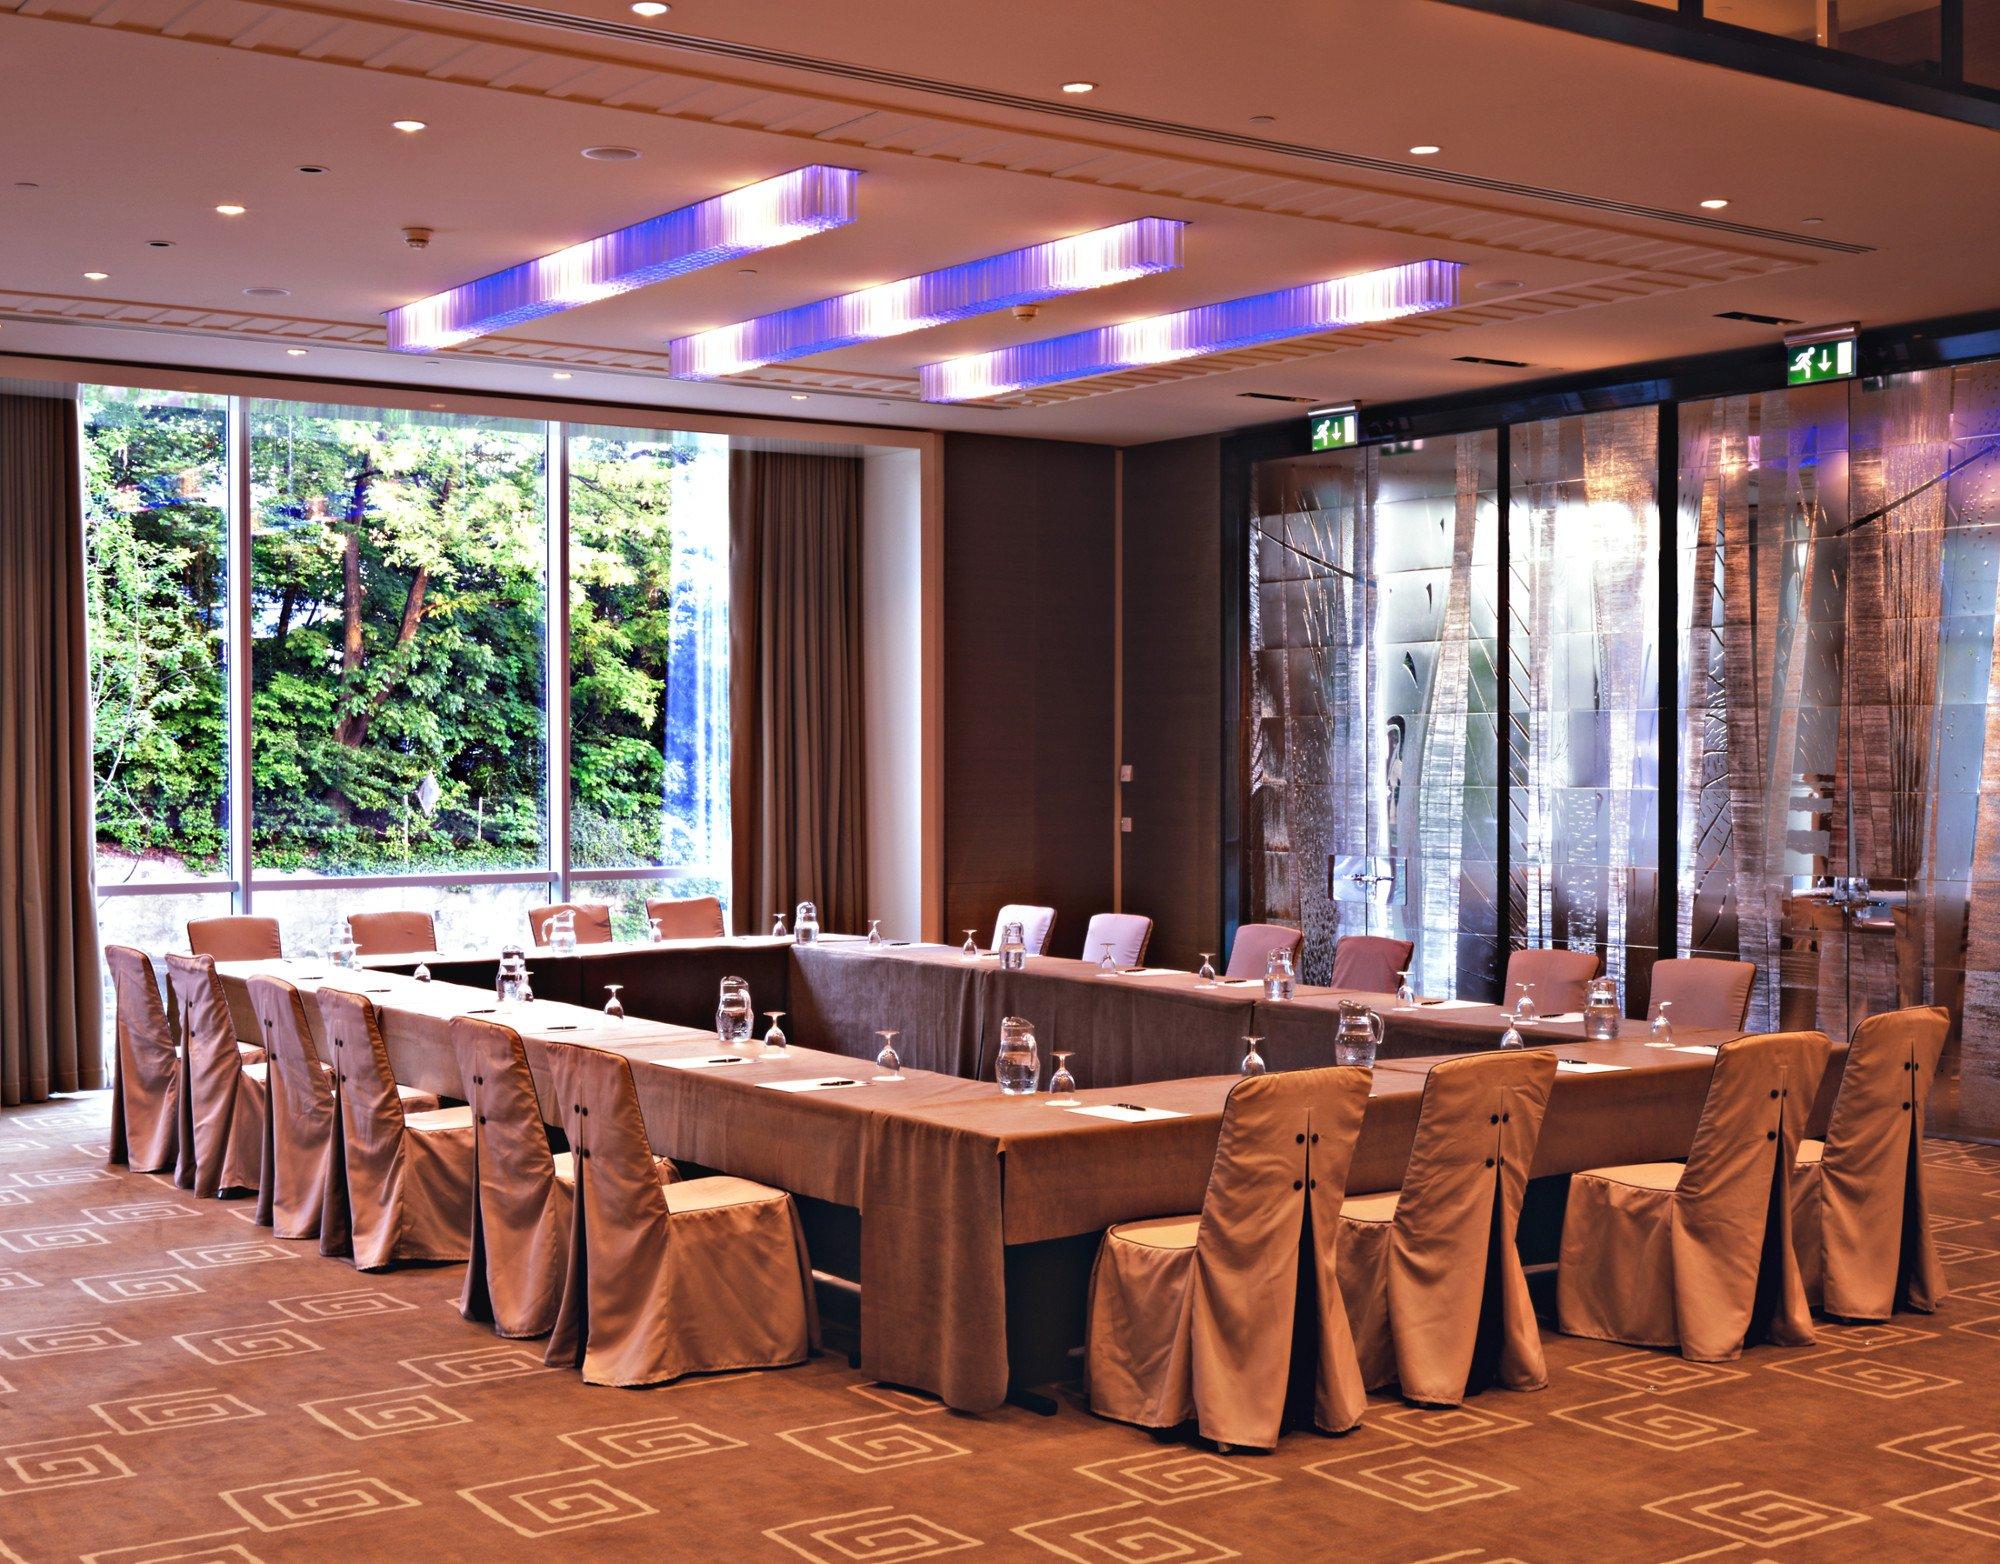 InterContinental-Geneva-Hotel-Meeting-Conference-Foyer-D-Ballroom